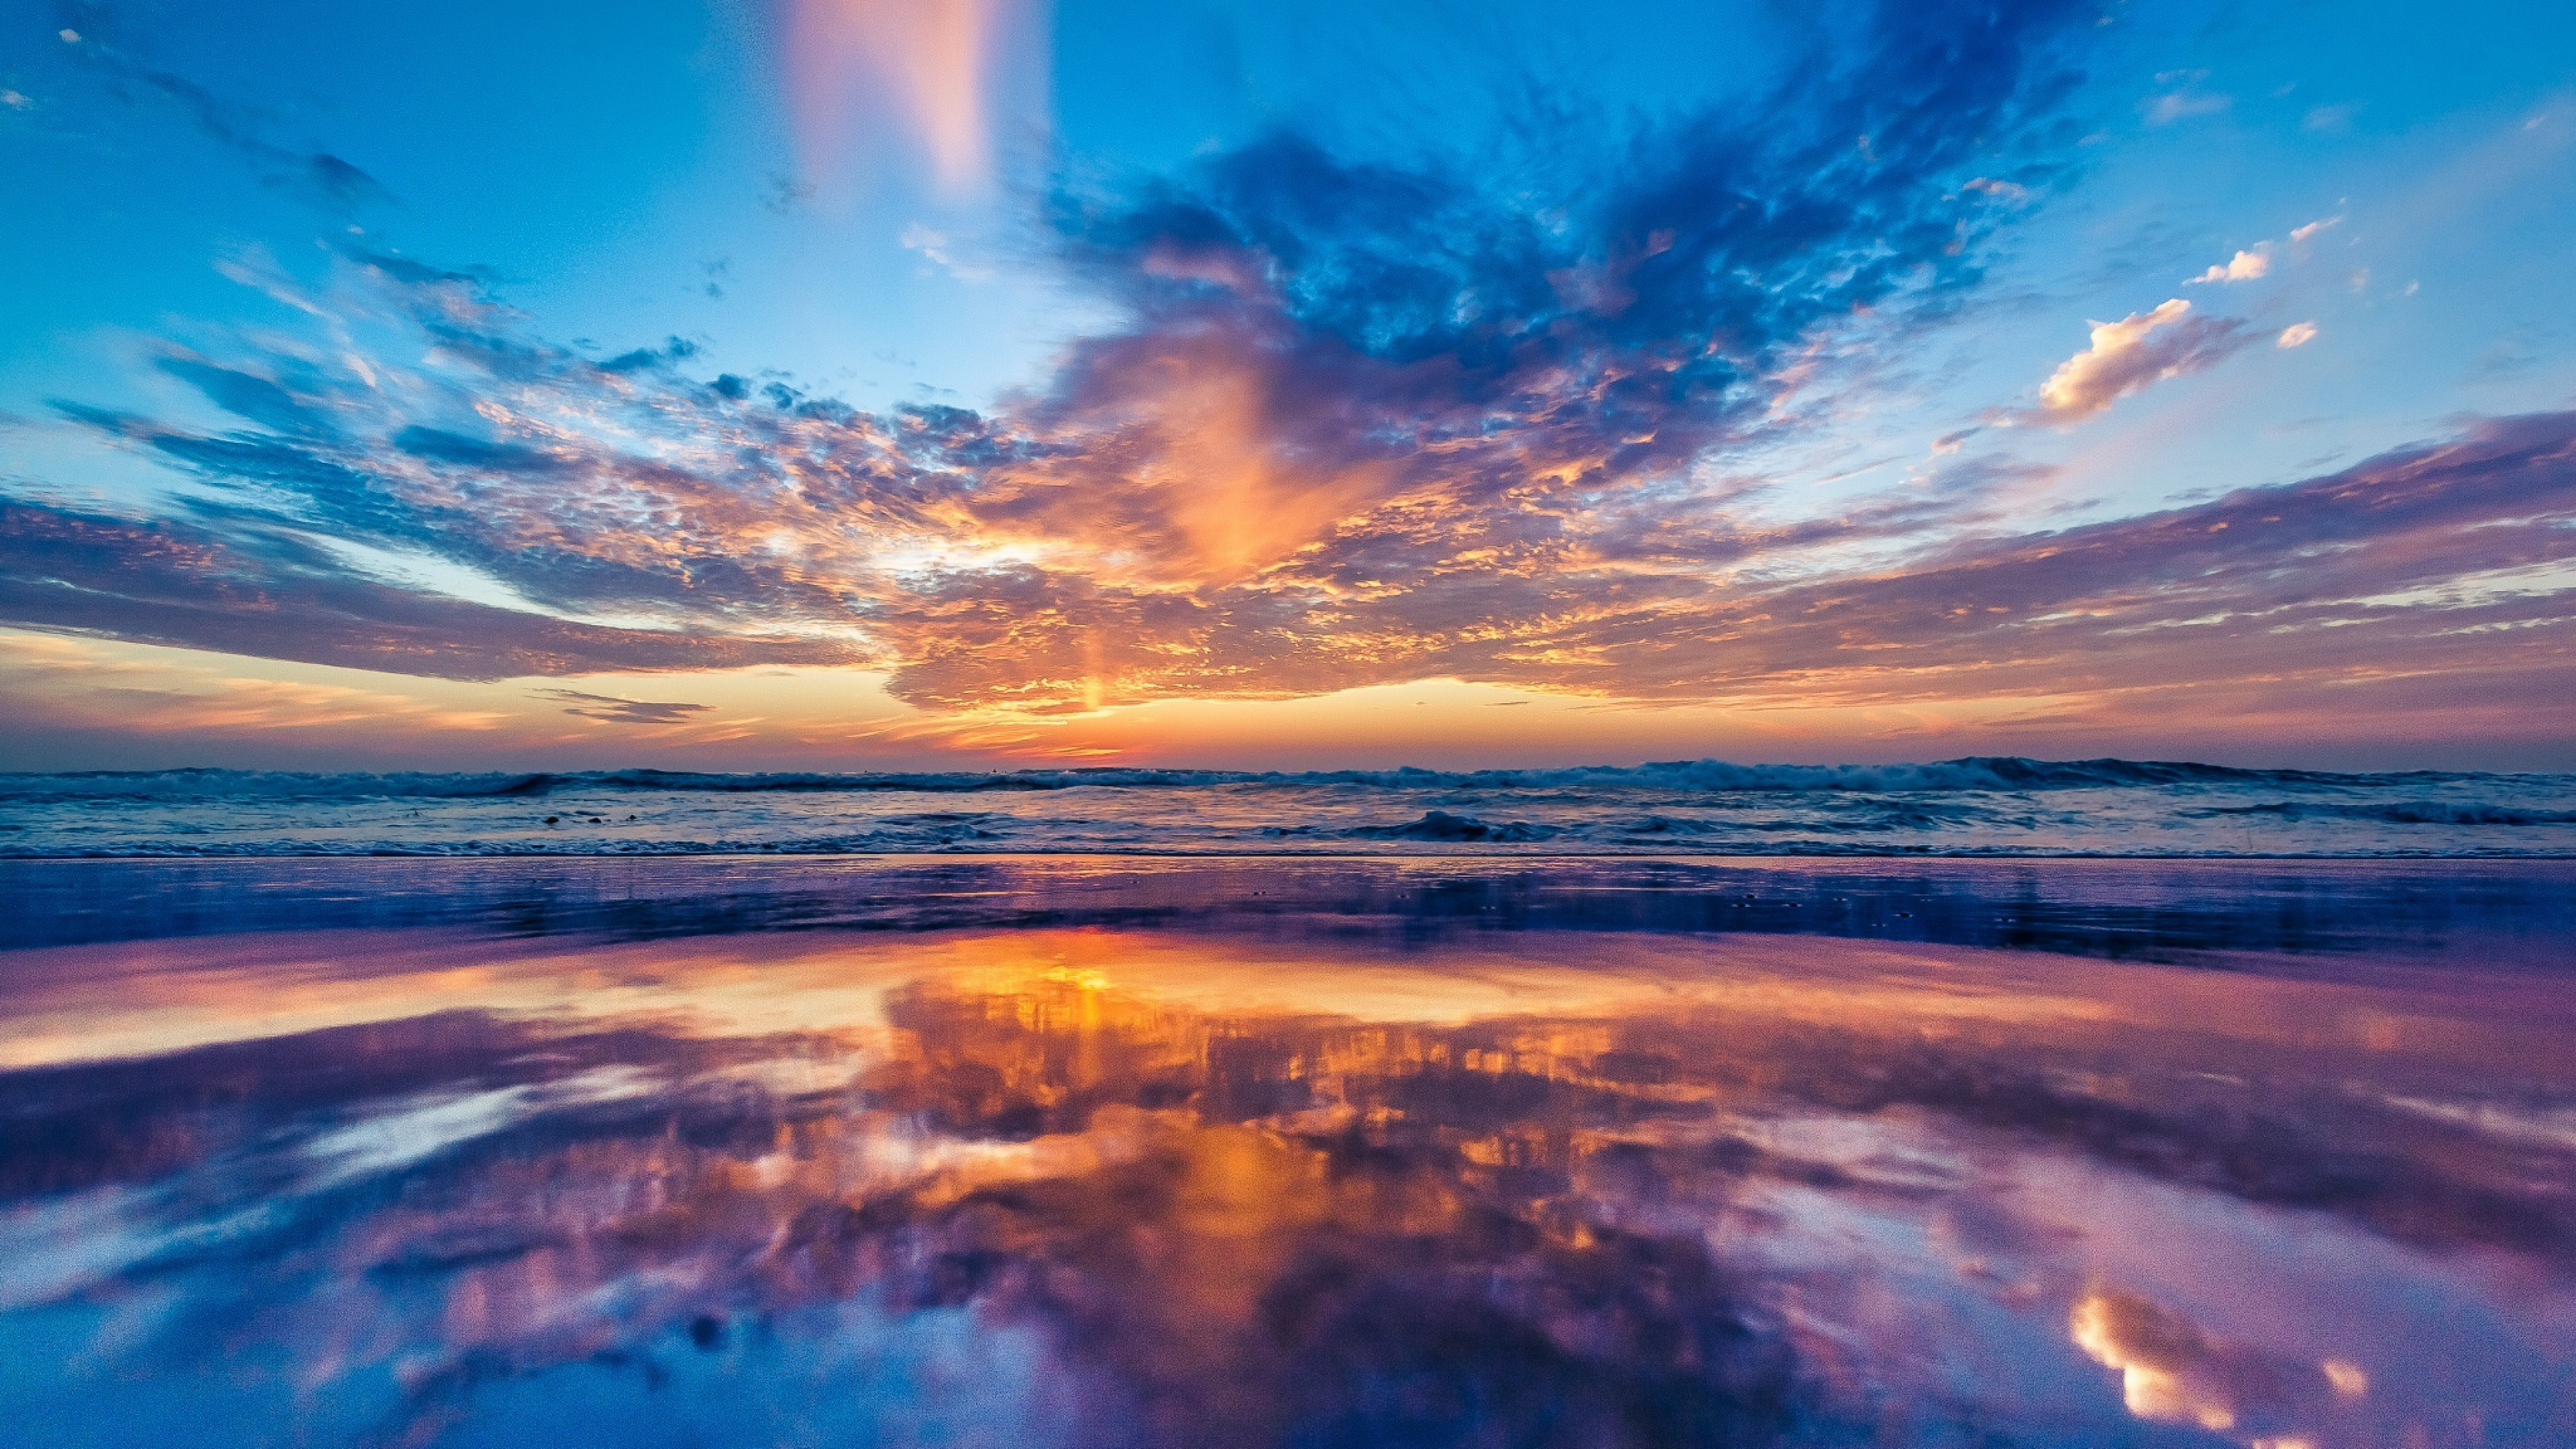 ocean sky sunset beach